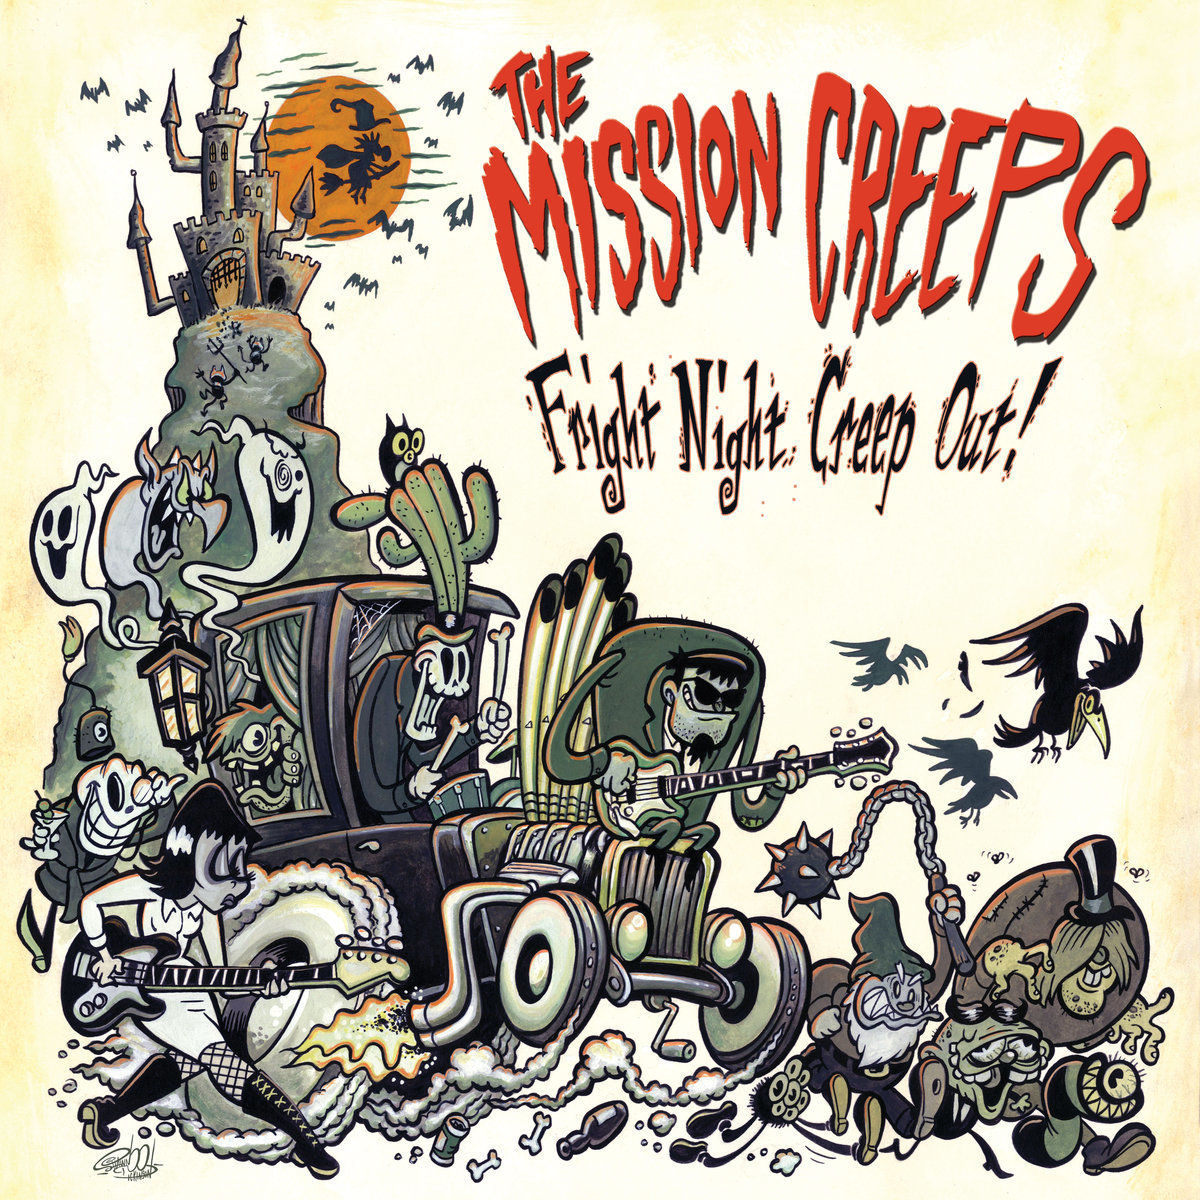 Fright Night Creep Out Orange Vinyl